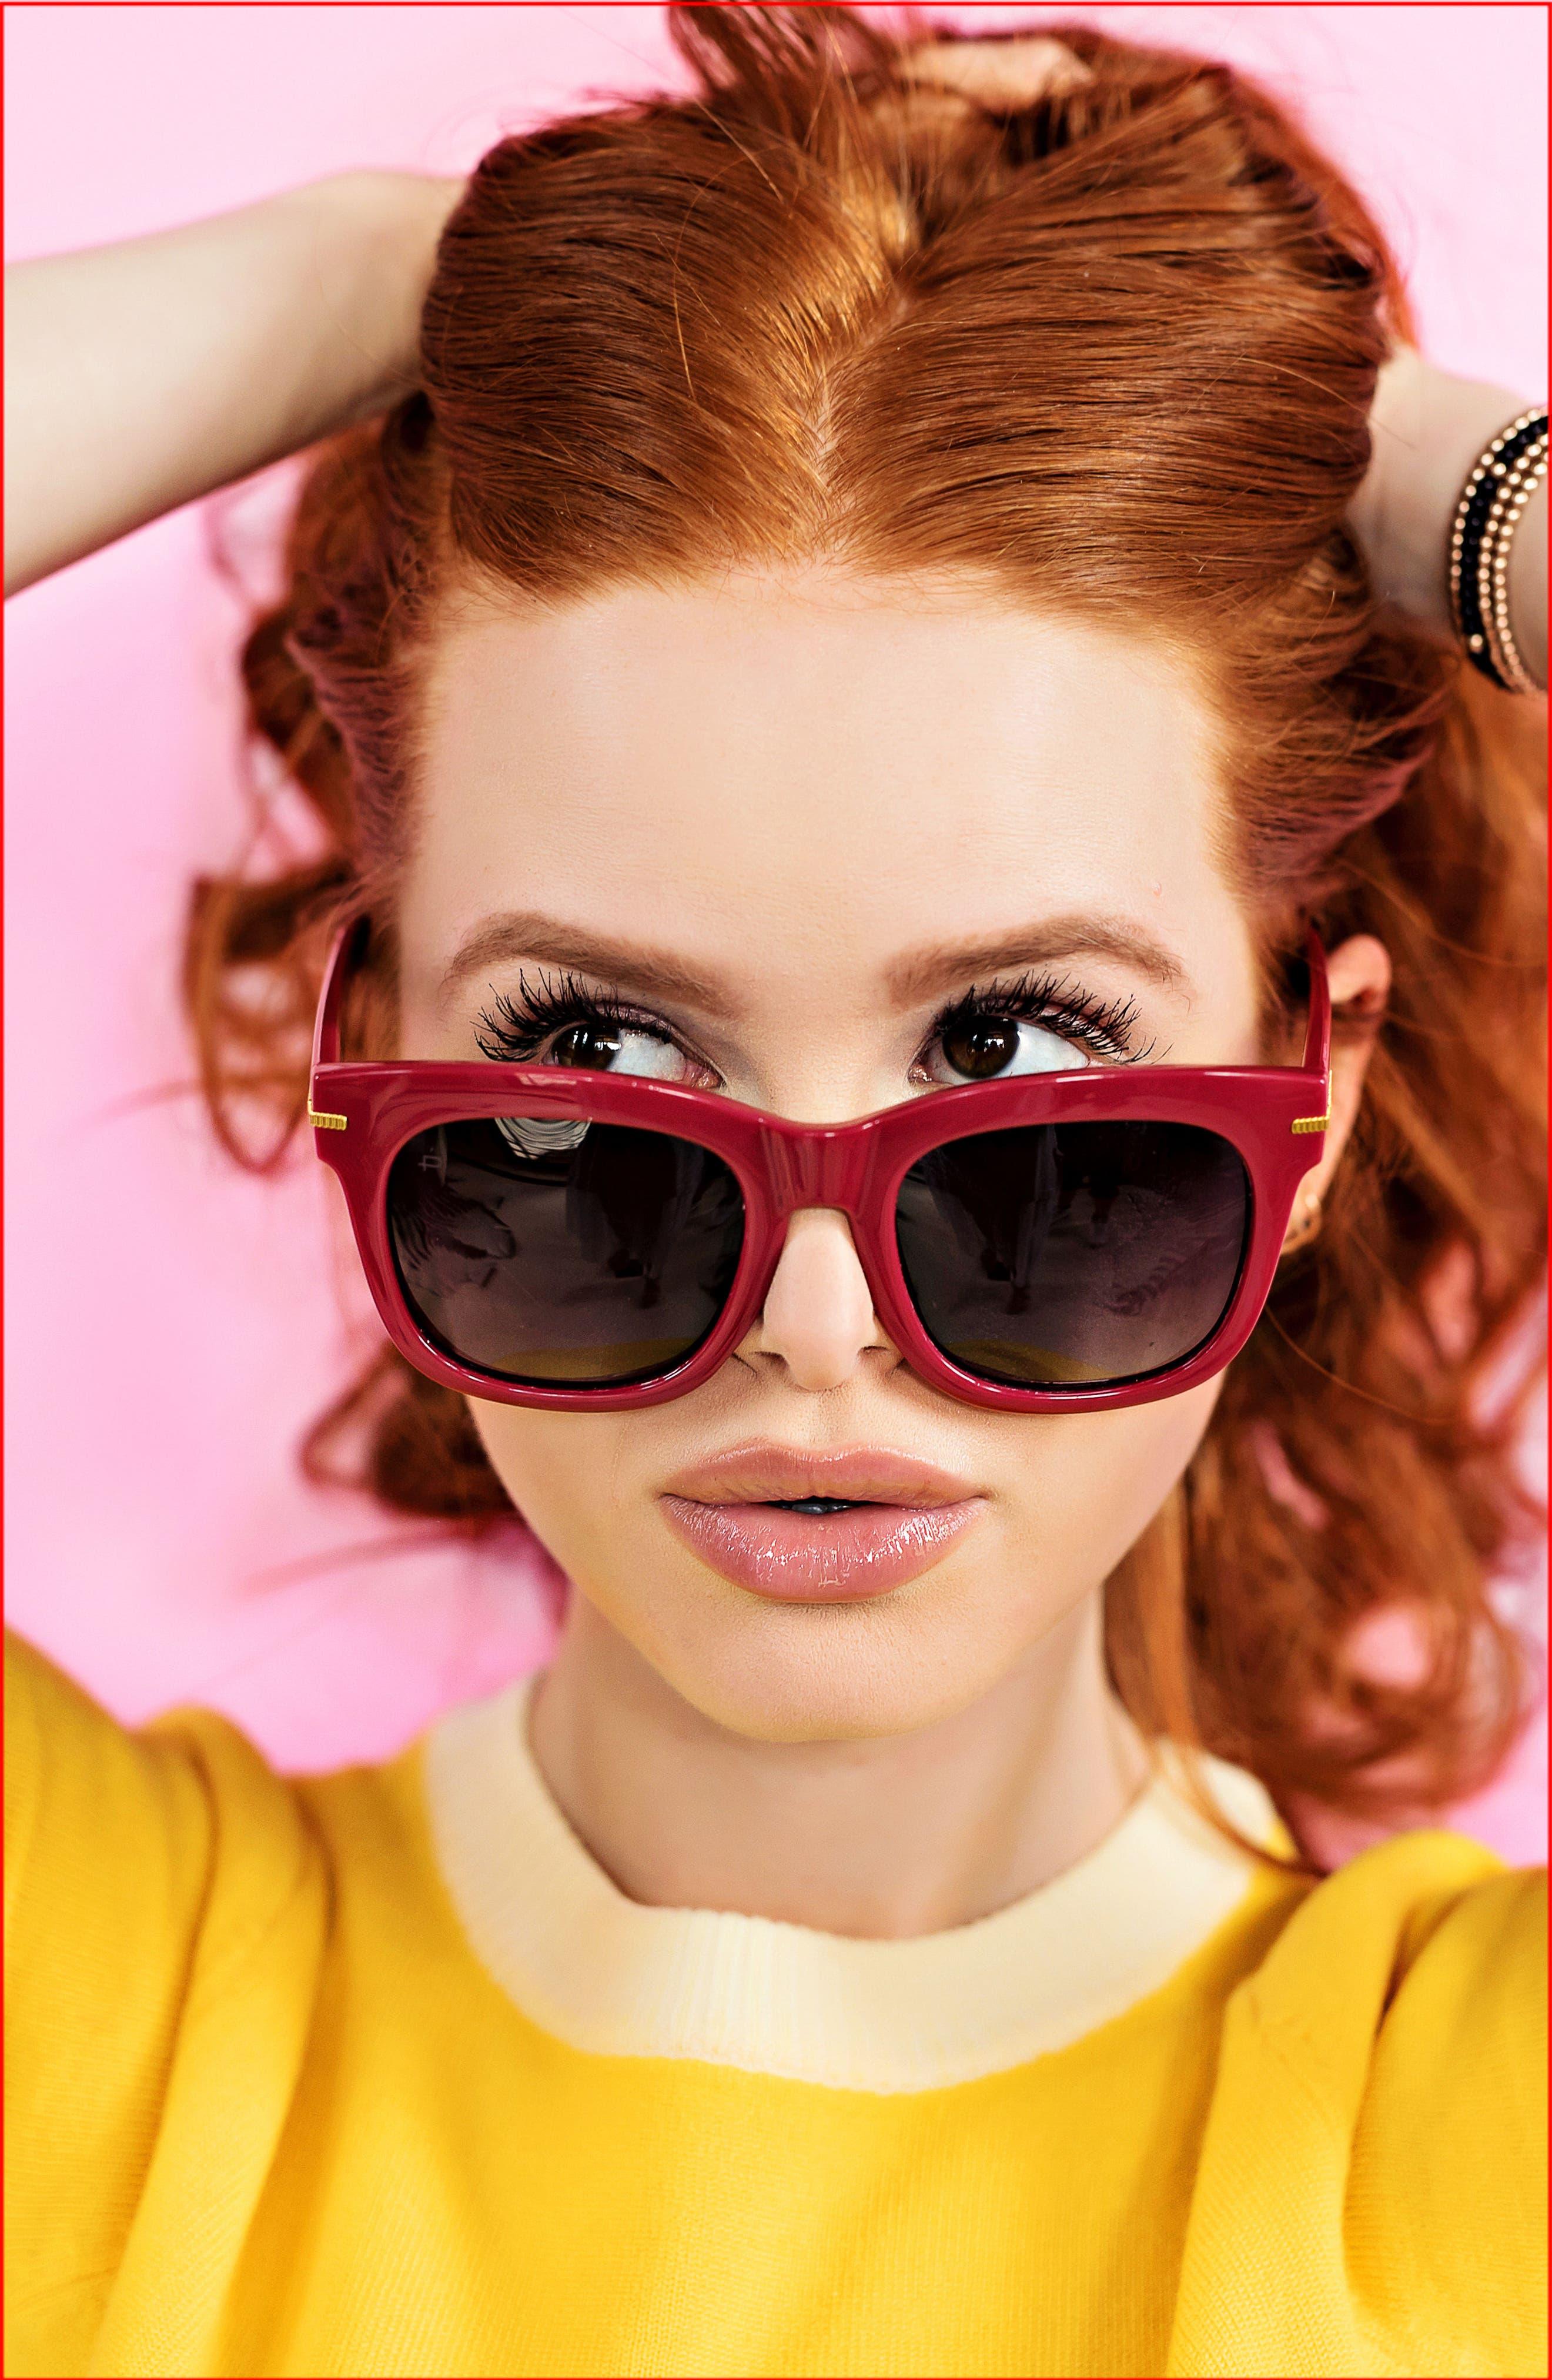 Privé Revaux x Madelaine Petsch The Clique 52mm Square Sunglasses,                         Main,                         color, 001